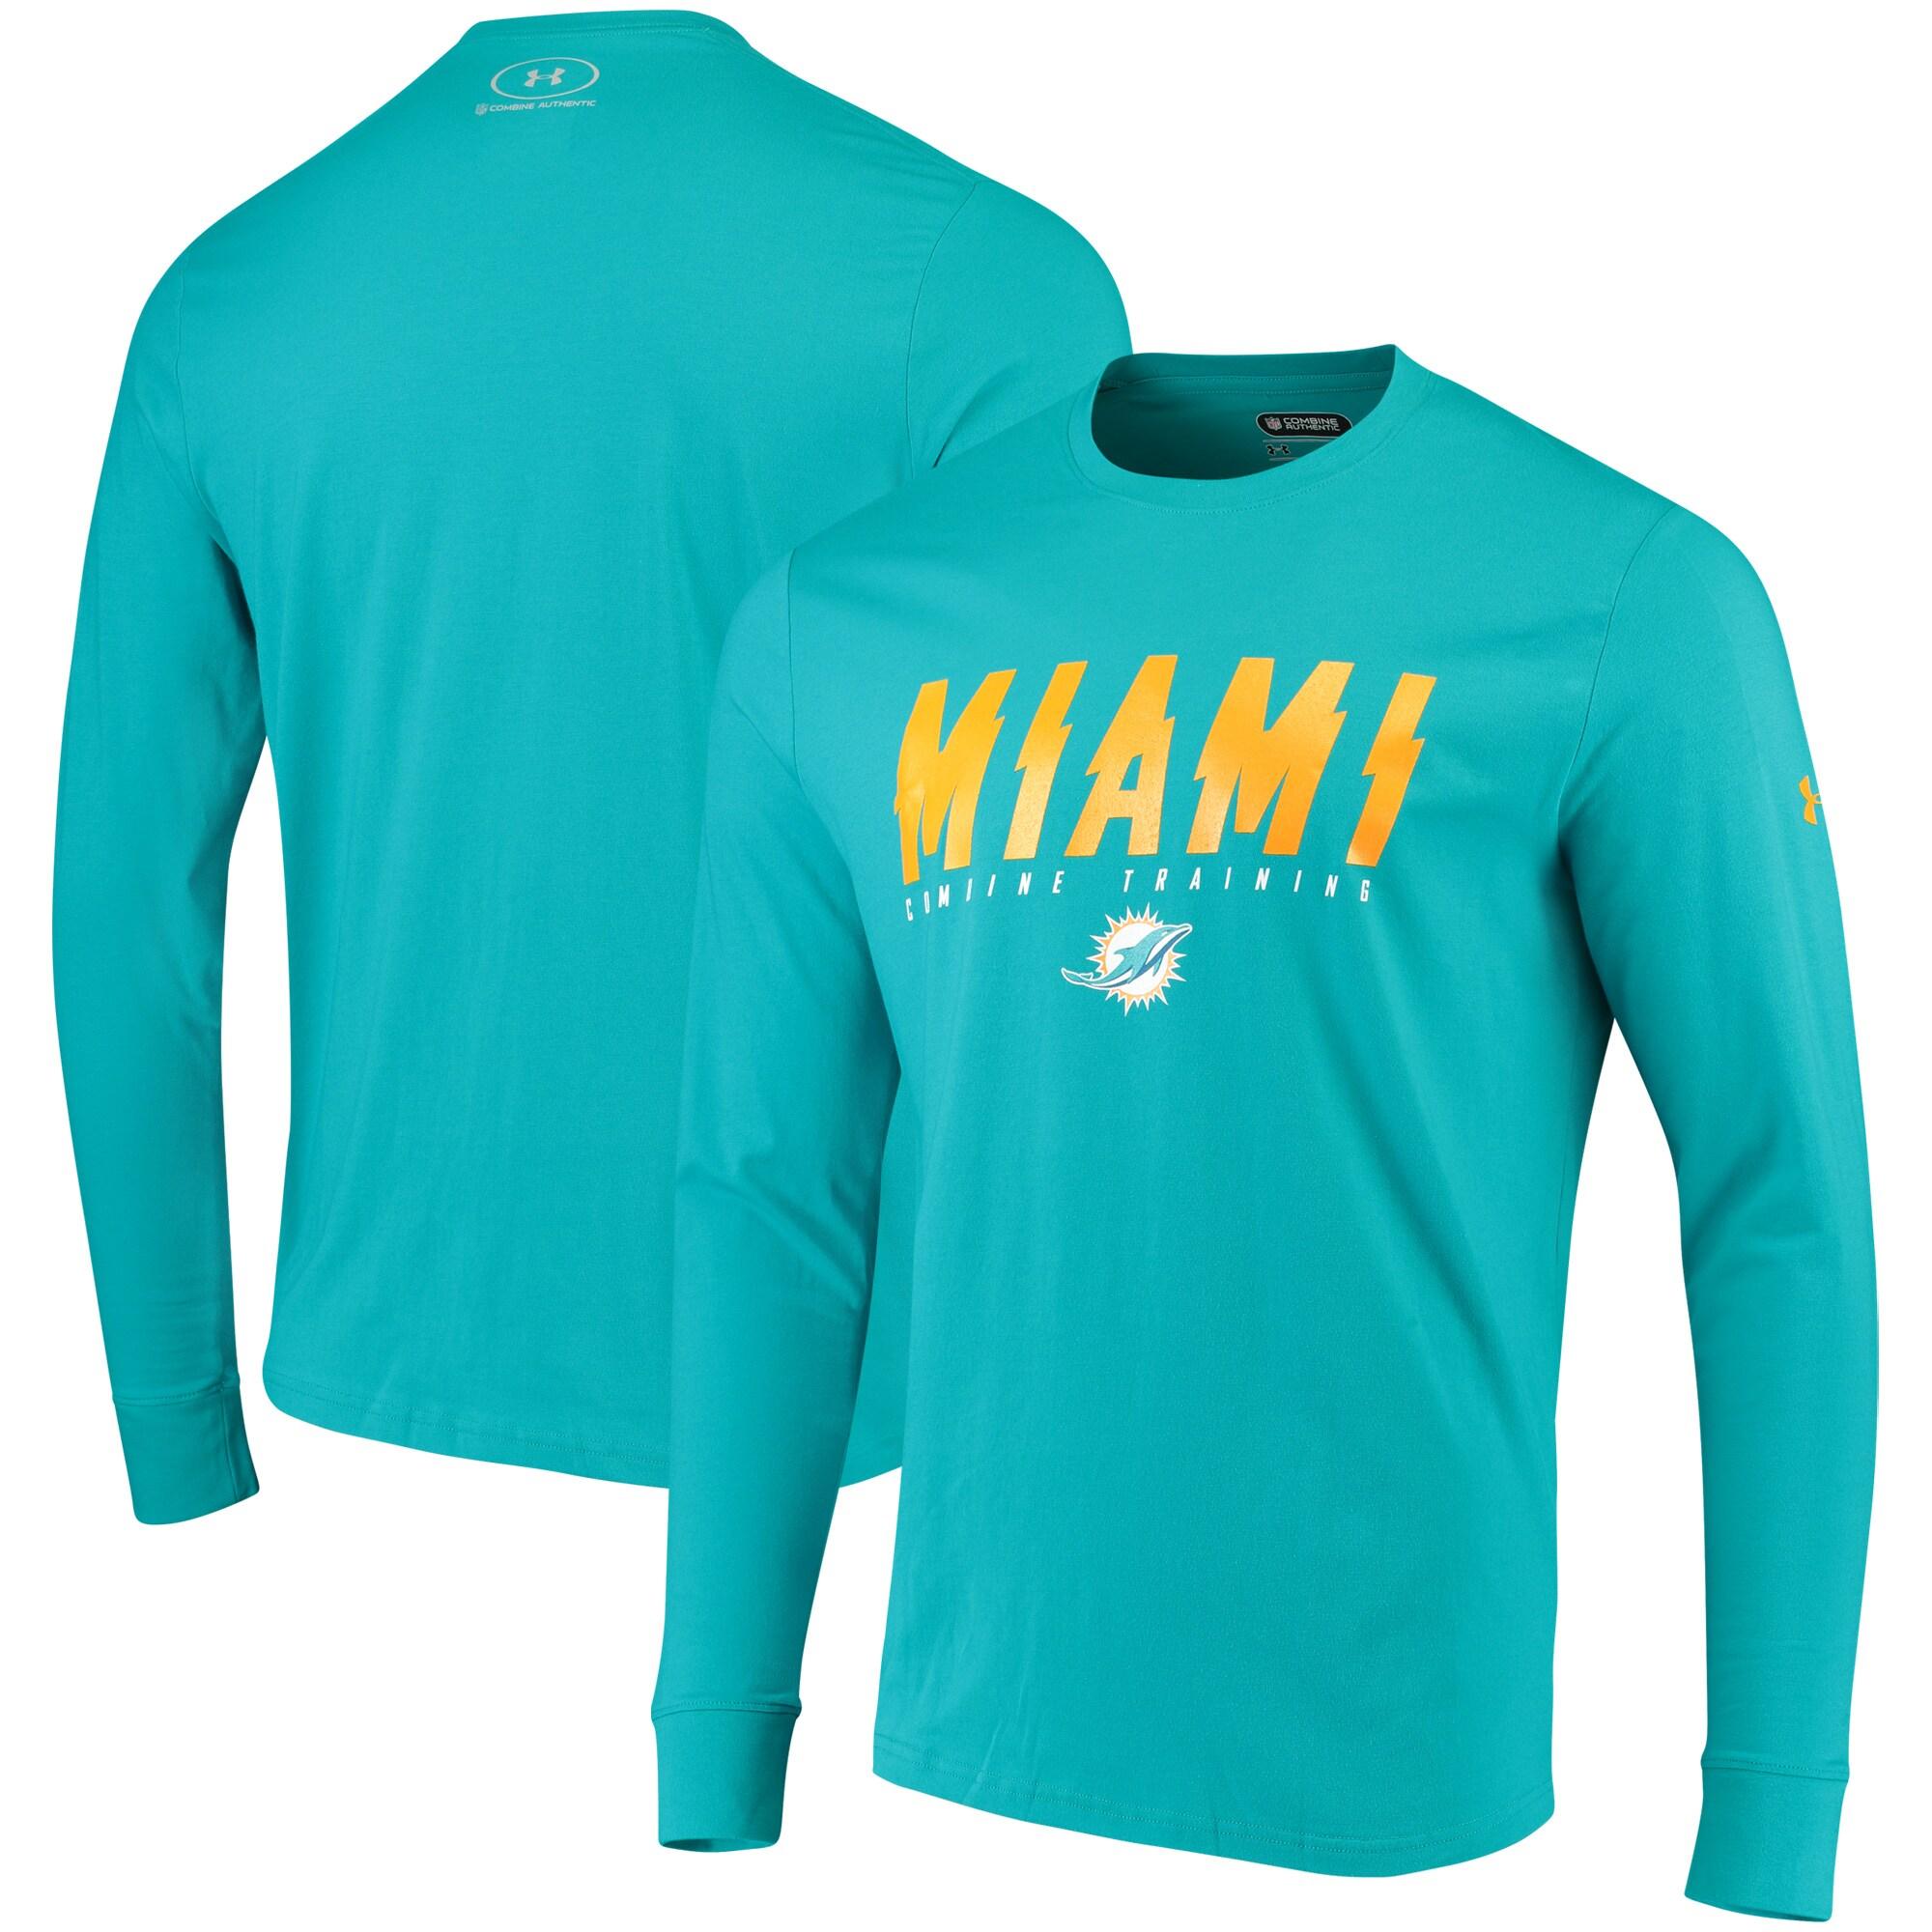 Miami Dolphins Under Armour Combine Authentic Wordmark Long Sleeve T-Shirt - Aqua